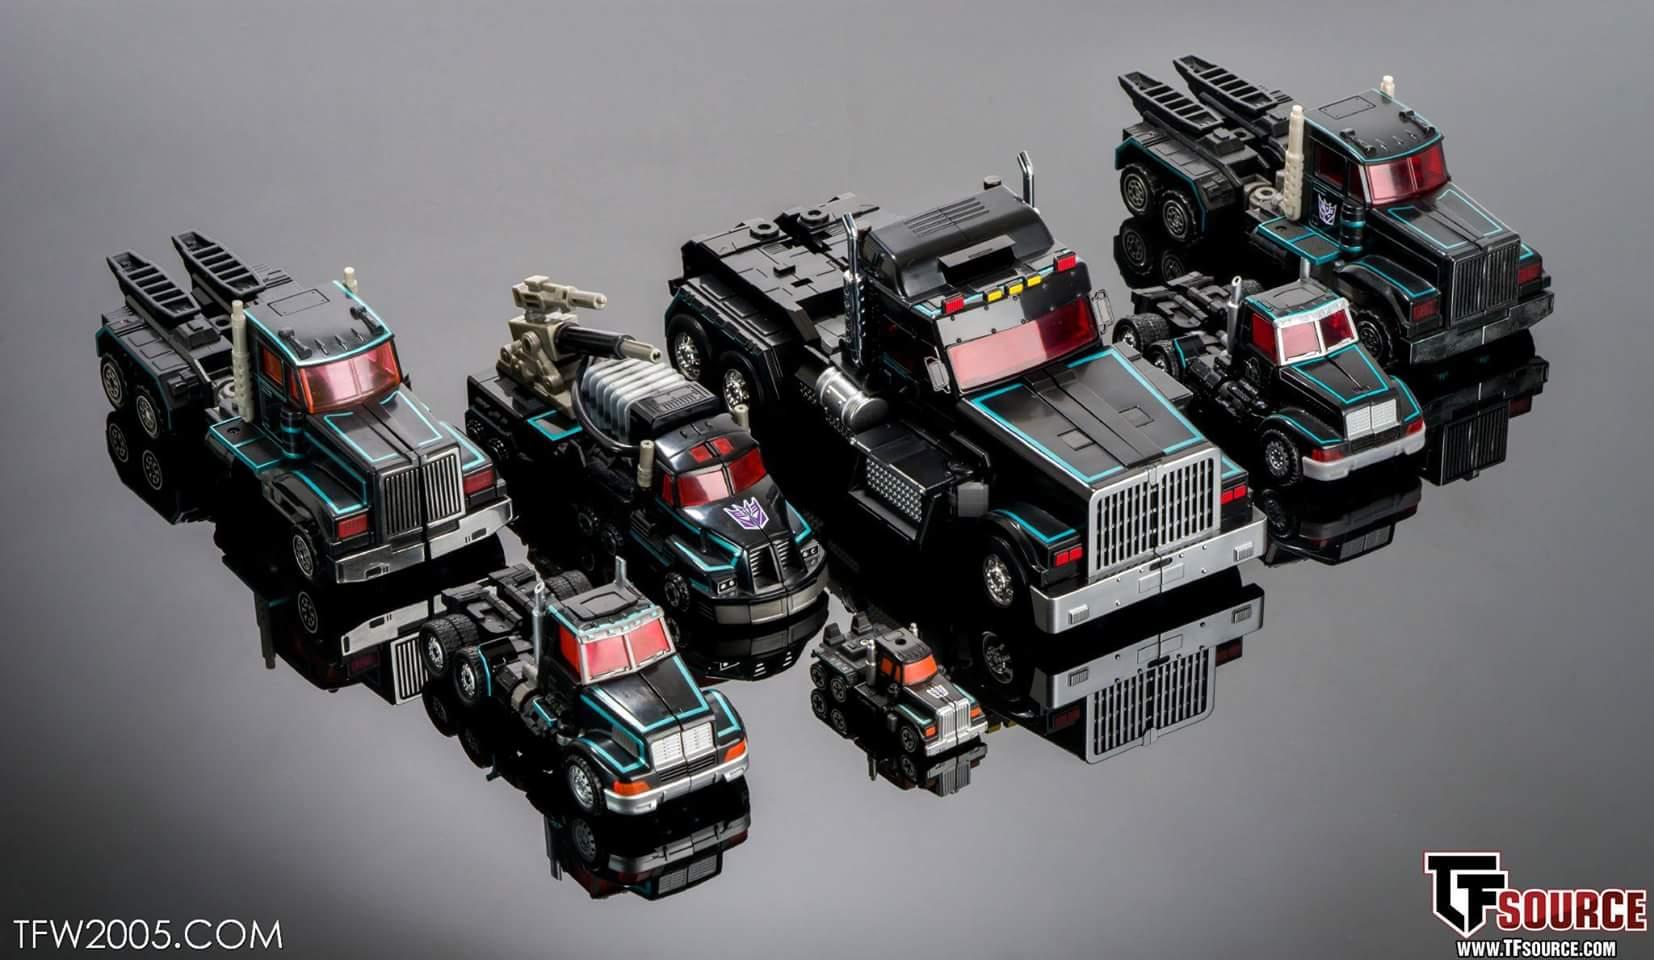 [FansHobby] Produit Tiers - Master Builder MB-01 Archenemy (aka Scourge RID 2000),  MB-04 Gunfighter II (aka Laser Optimus G2) et MB-09 Trailer (remorque) QcCmh4Nl